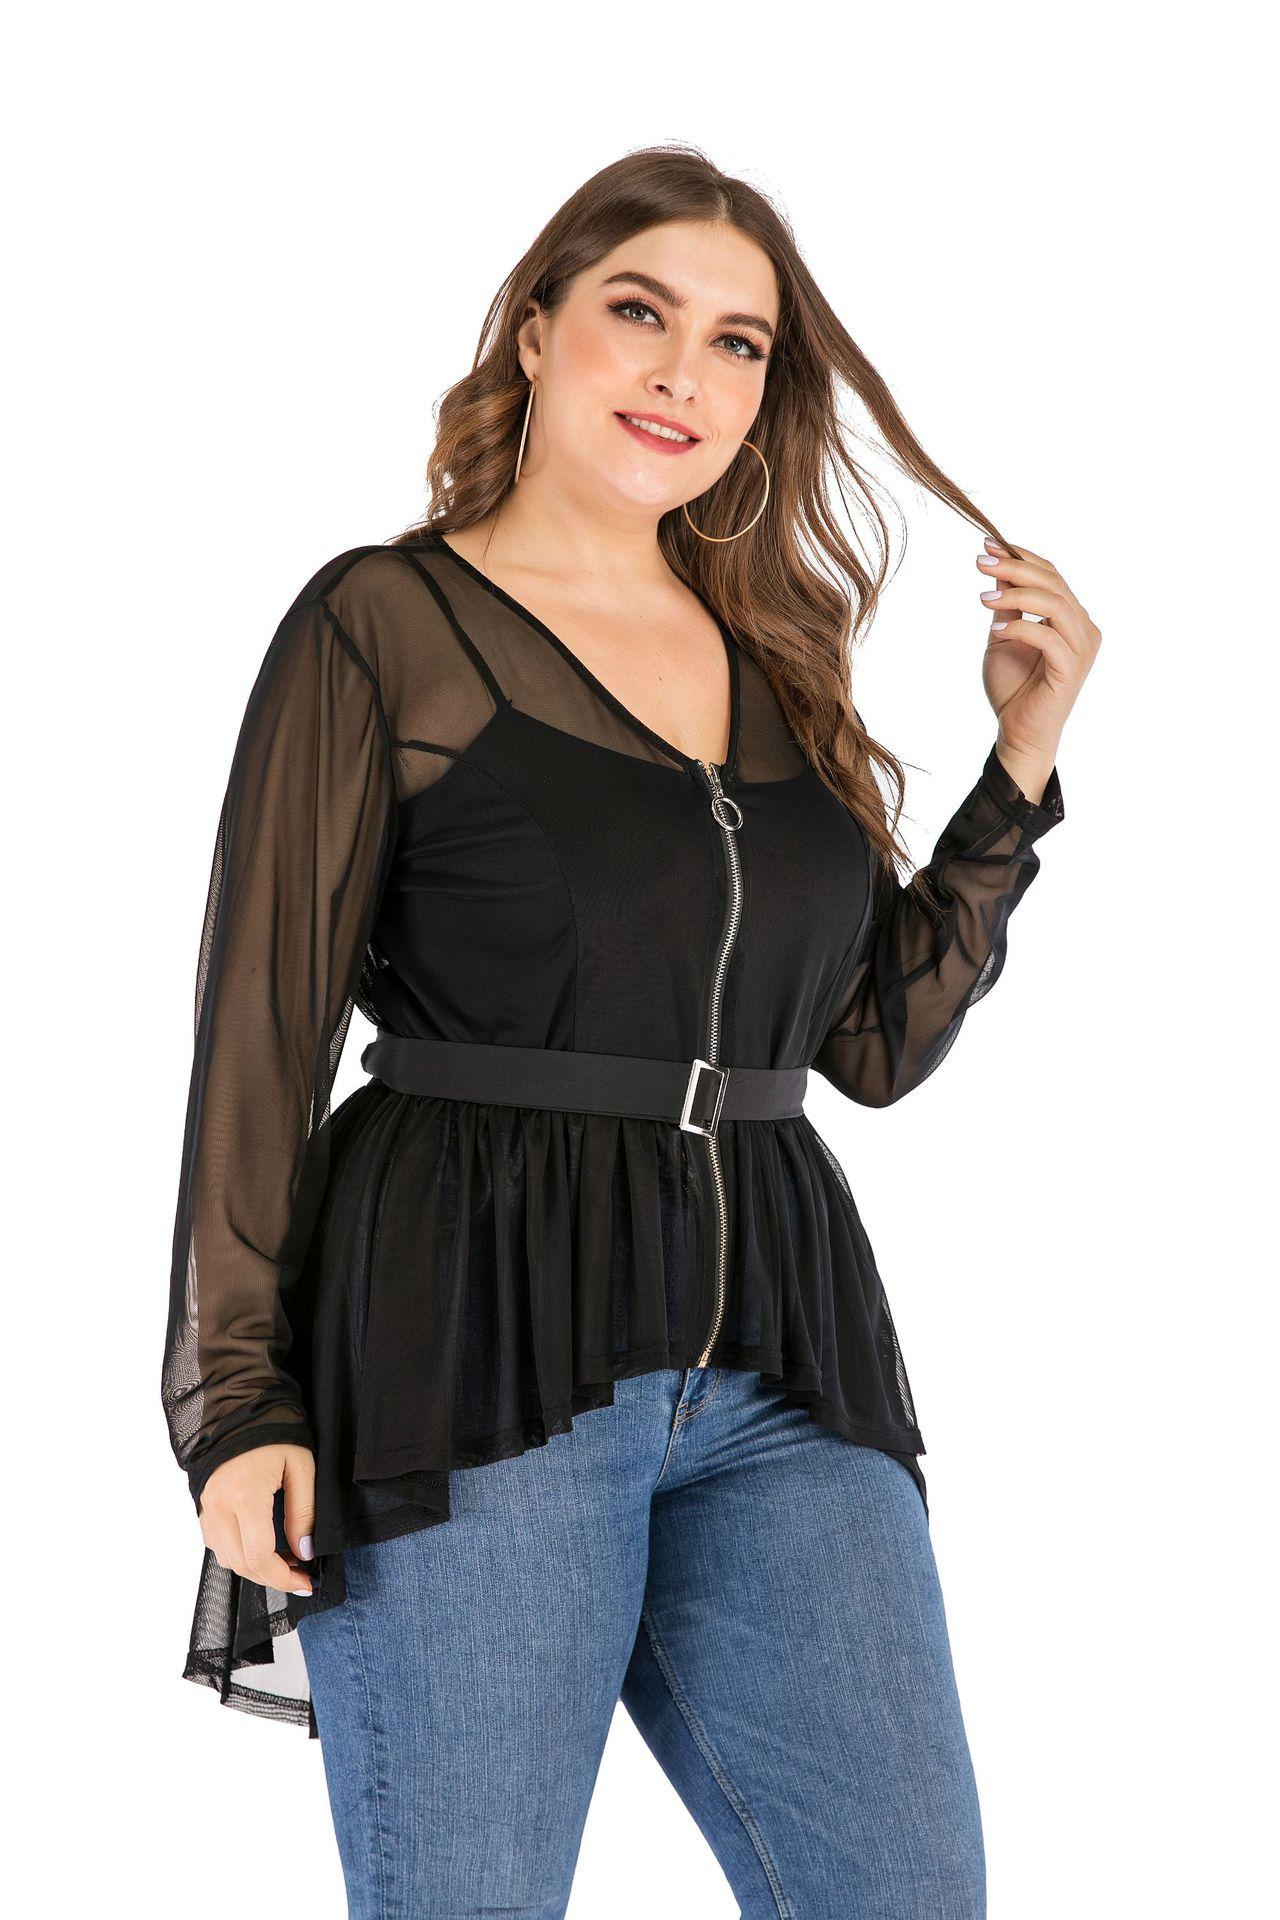 Sexy Mesh Thin Sexy Blouse Asymmetrical Mujer Transparente Fluoroscopia Blusa Casual Verano Tops Zipper Summer Shirts T99370